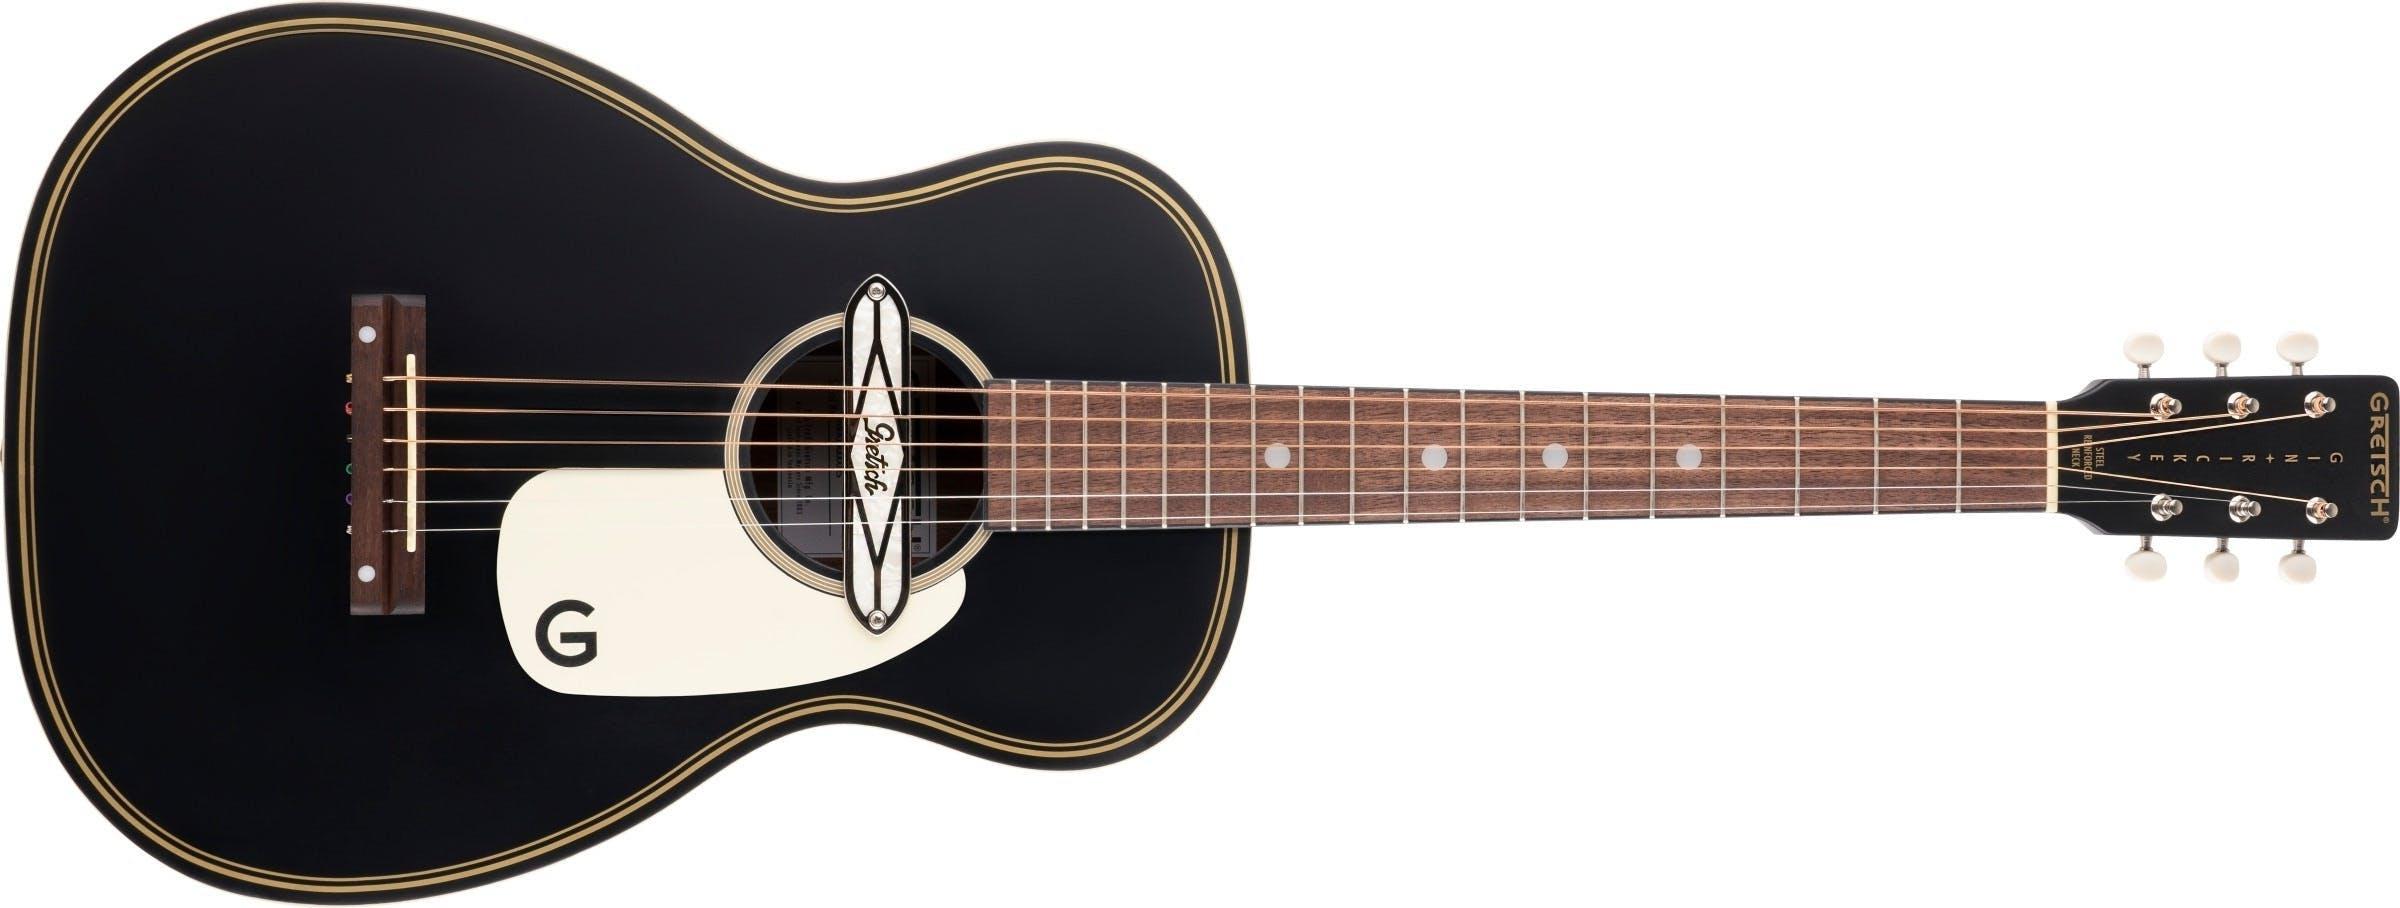 GRETSCH-G9520E-Gin-Rickey-Acoustic-Electric-WF-Smokestack-Black-2705000506-sku-24064